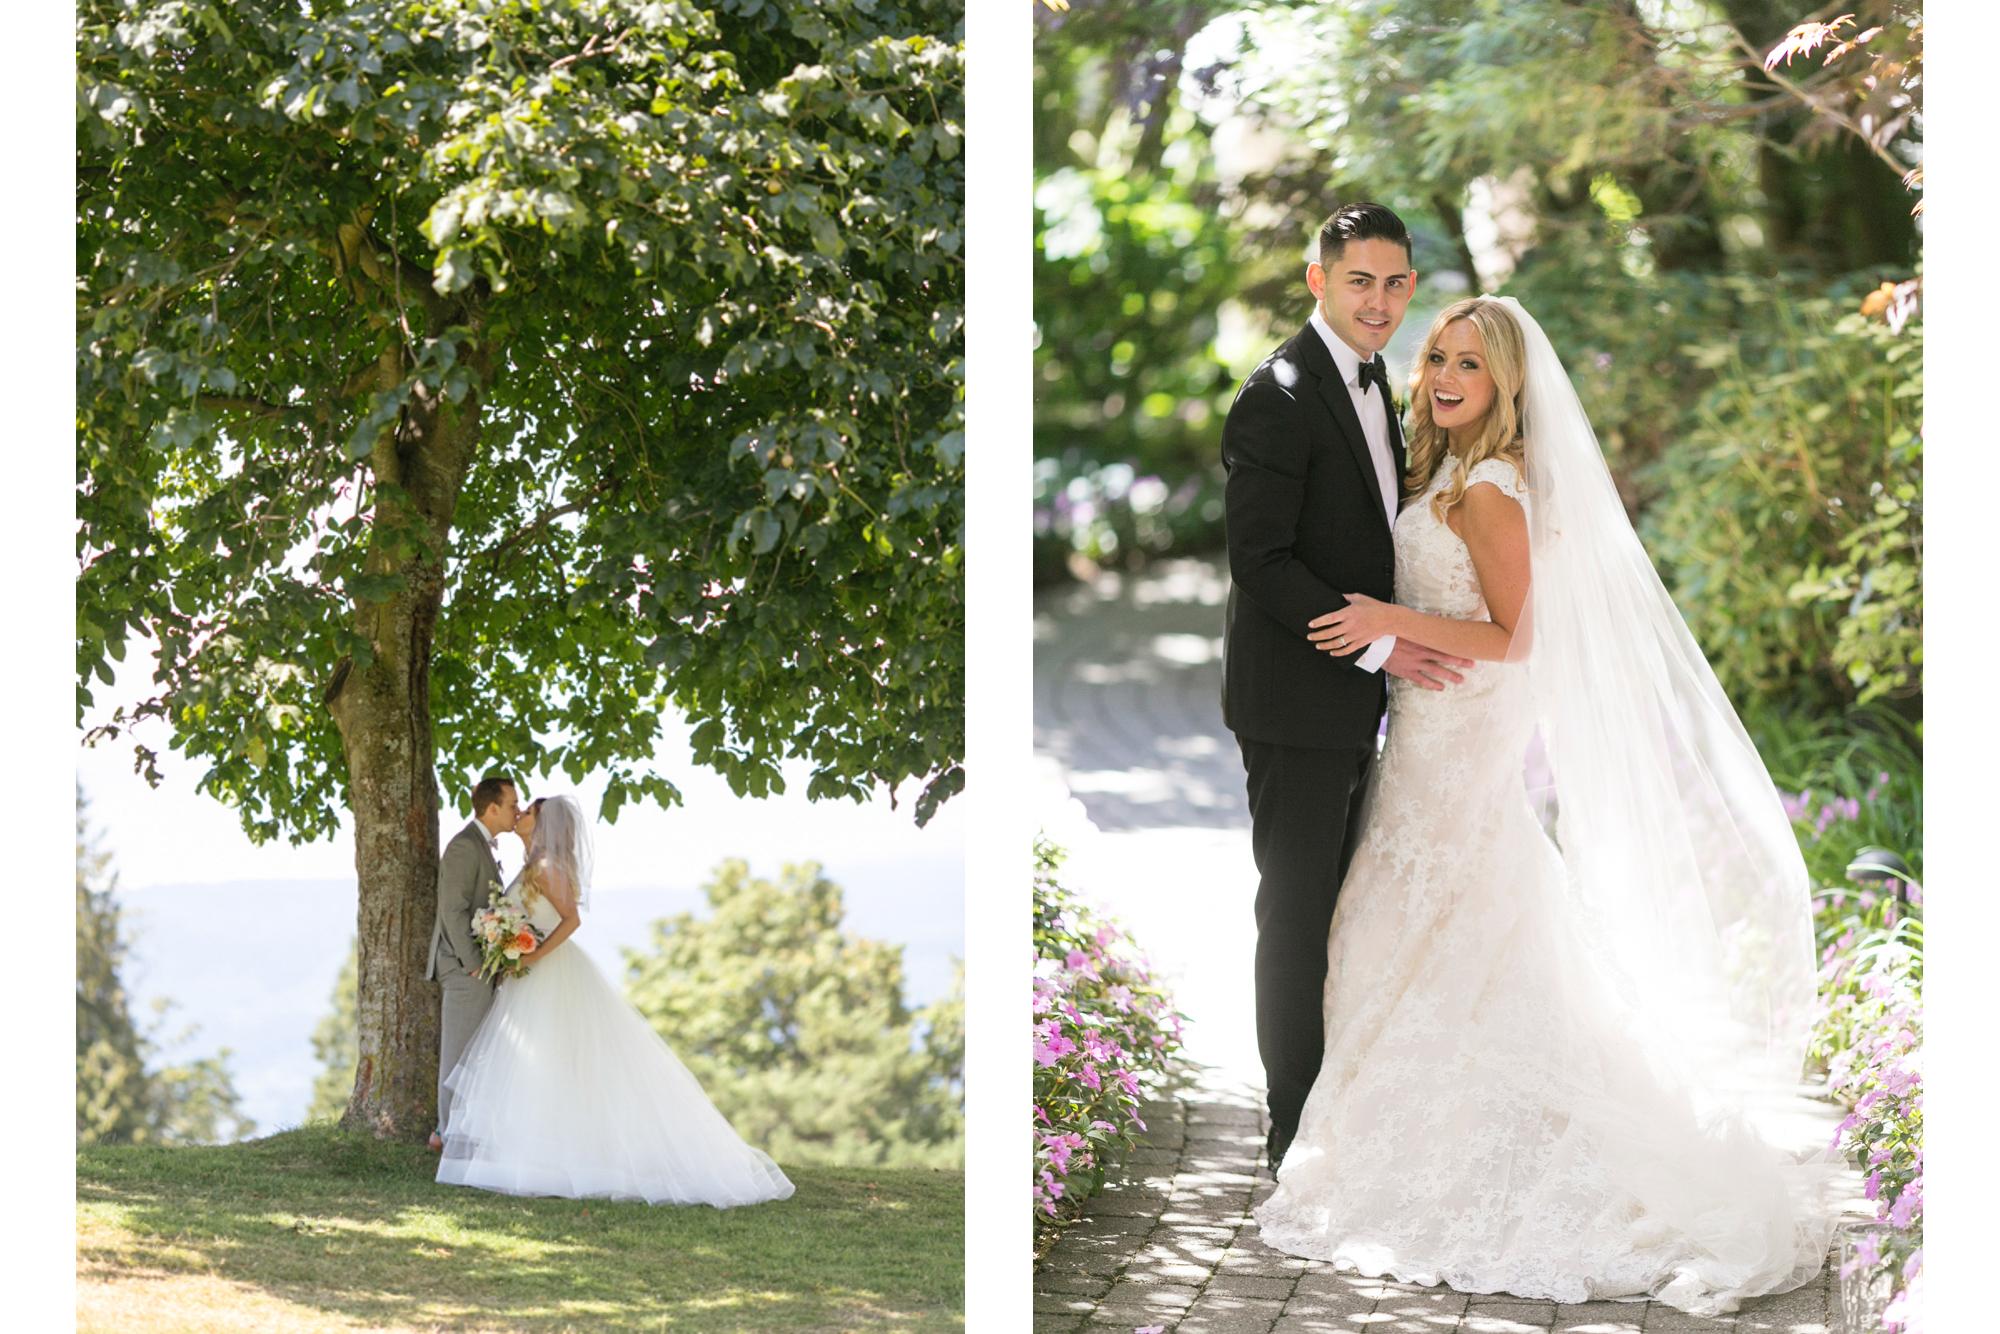 vancouver-luxury-wedding-photographer-lori-miles-17.jpg